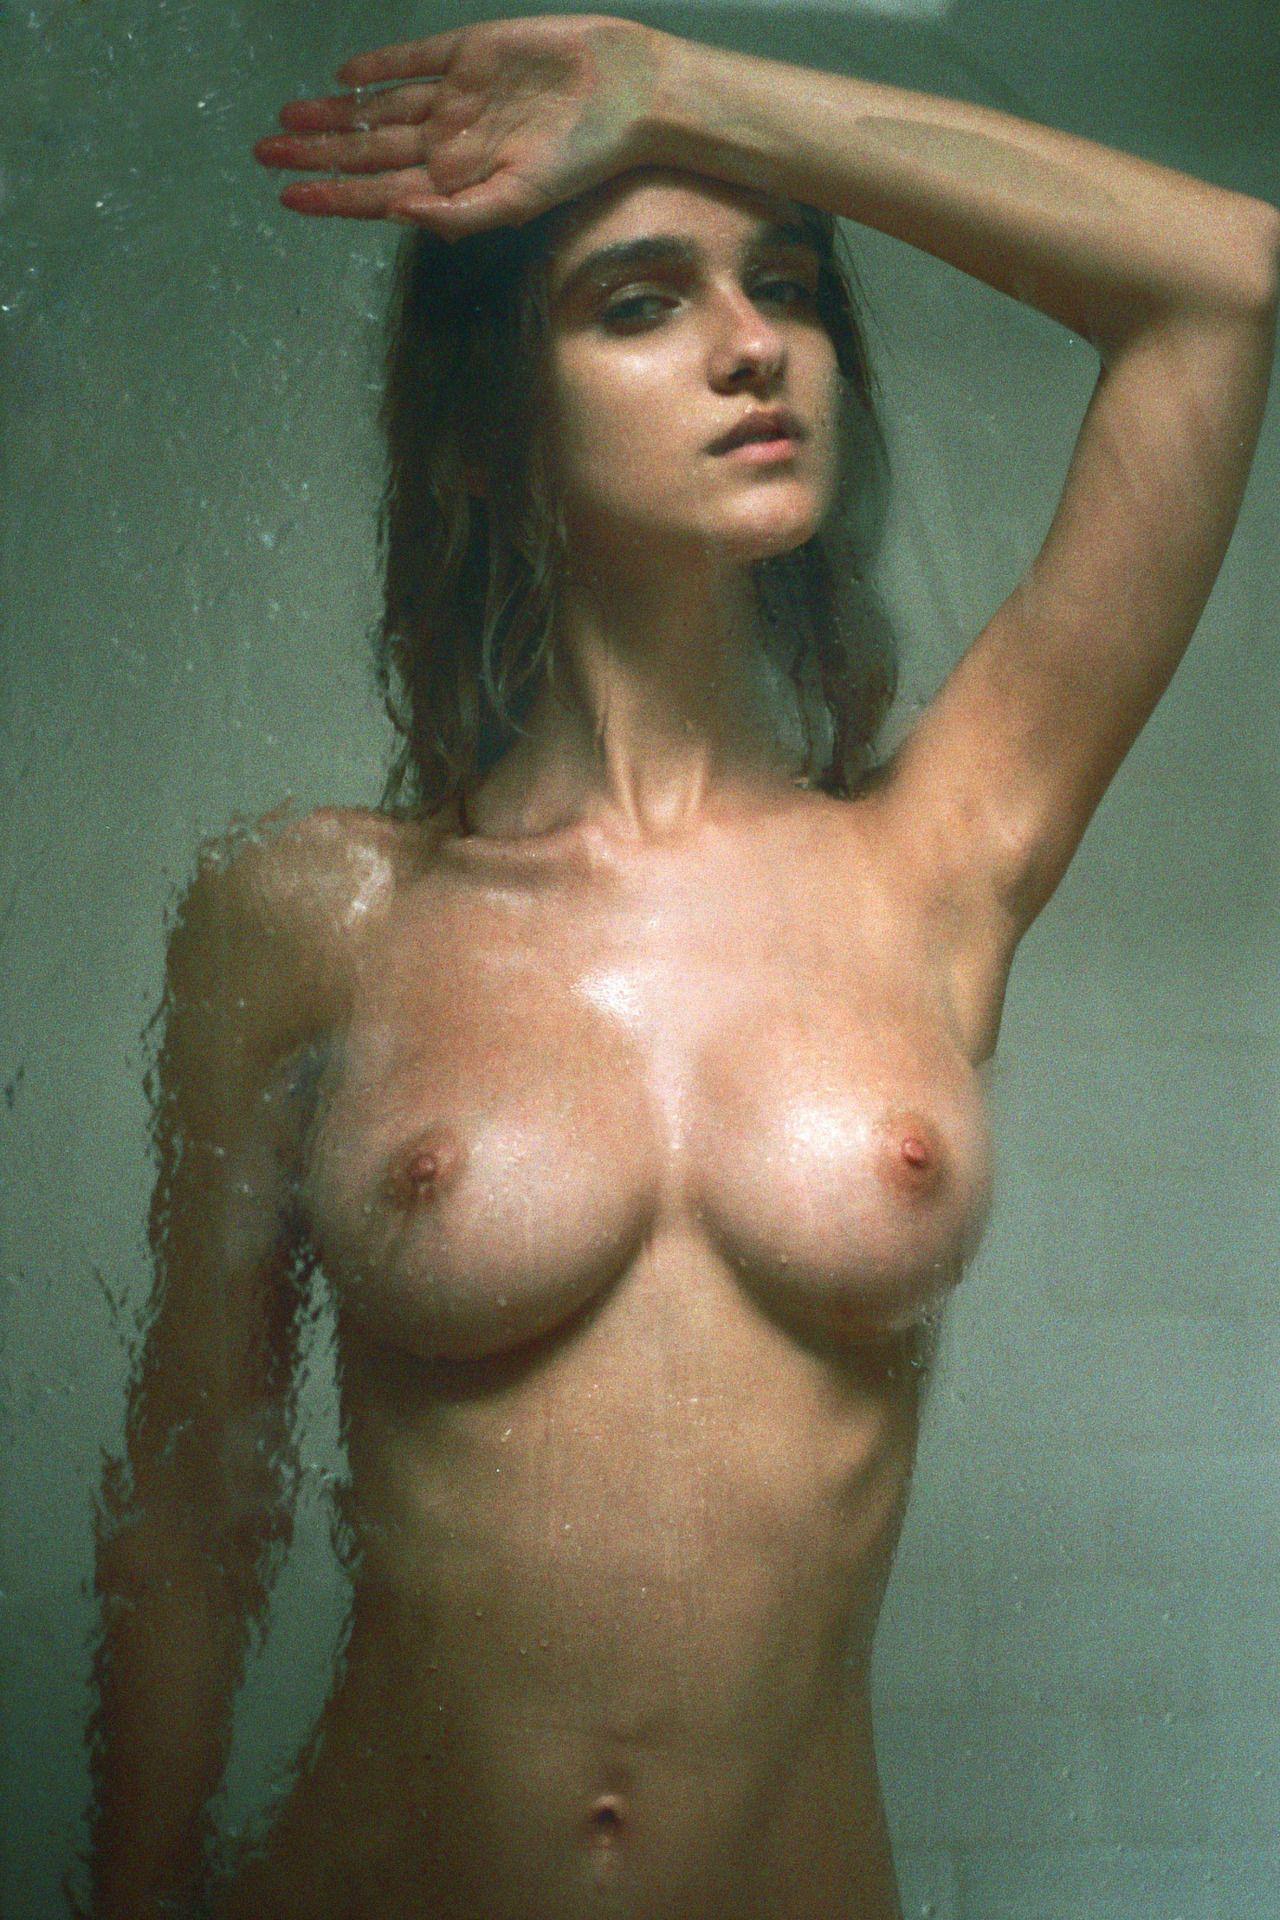 Ana Paula Naked paula bulczynska porn pic - eporner